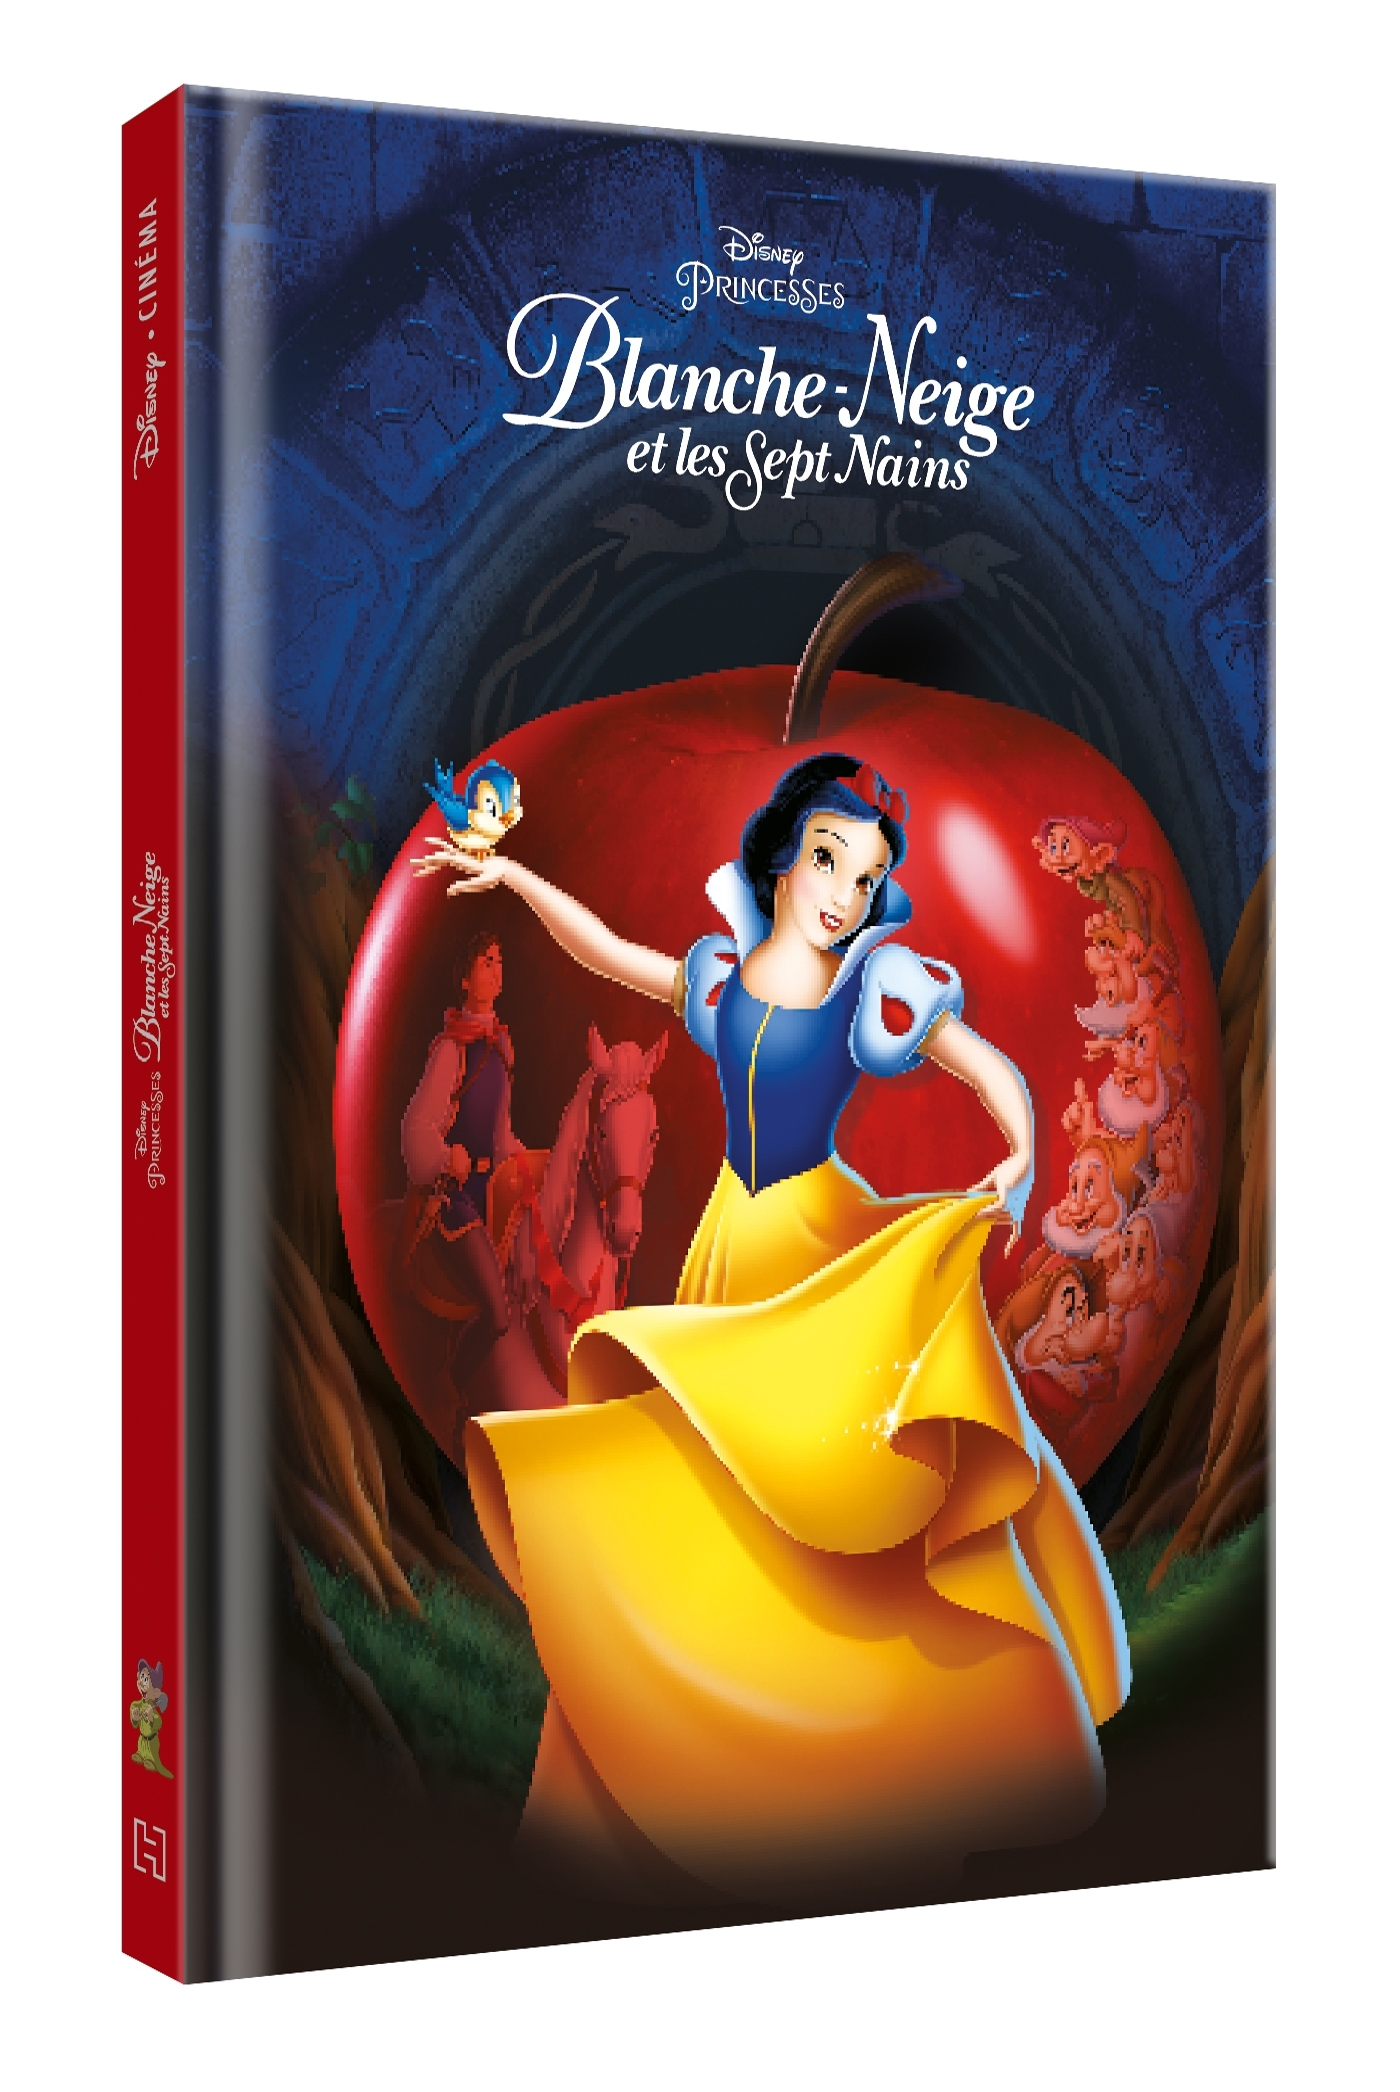 BLANCHE NEIGE - DISNEY CINEMA - L'HISTOIRE DU FILM